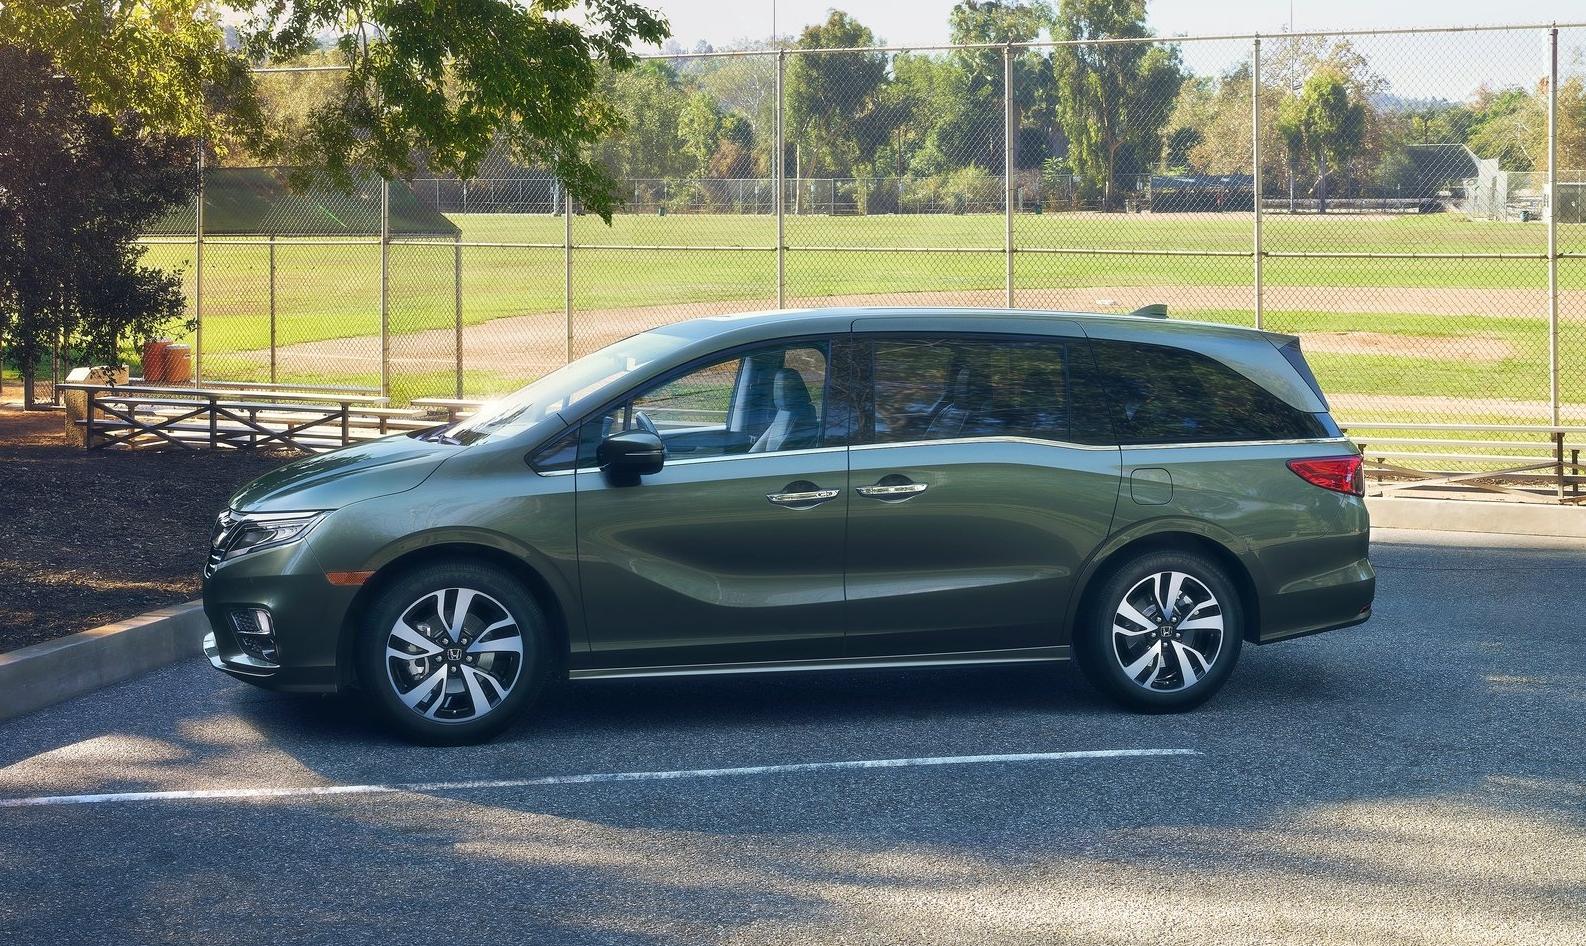 2018 Honda Odyssey Video Review